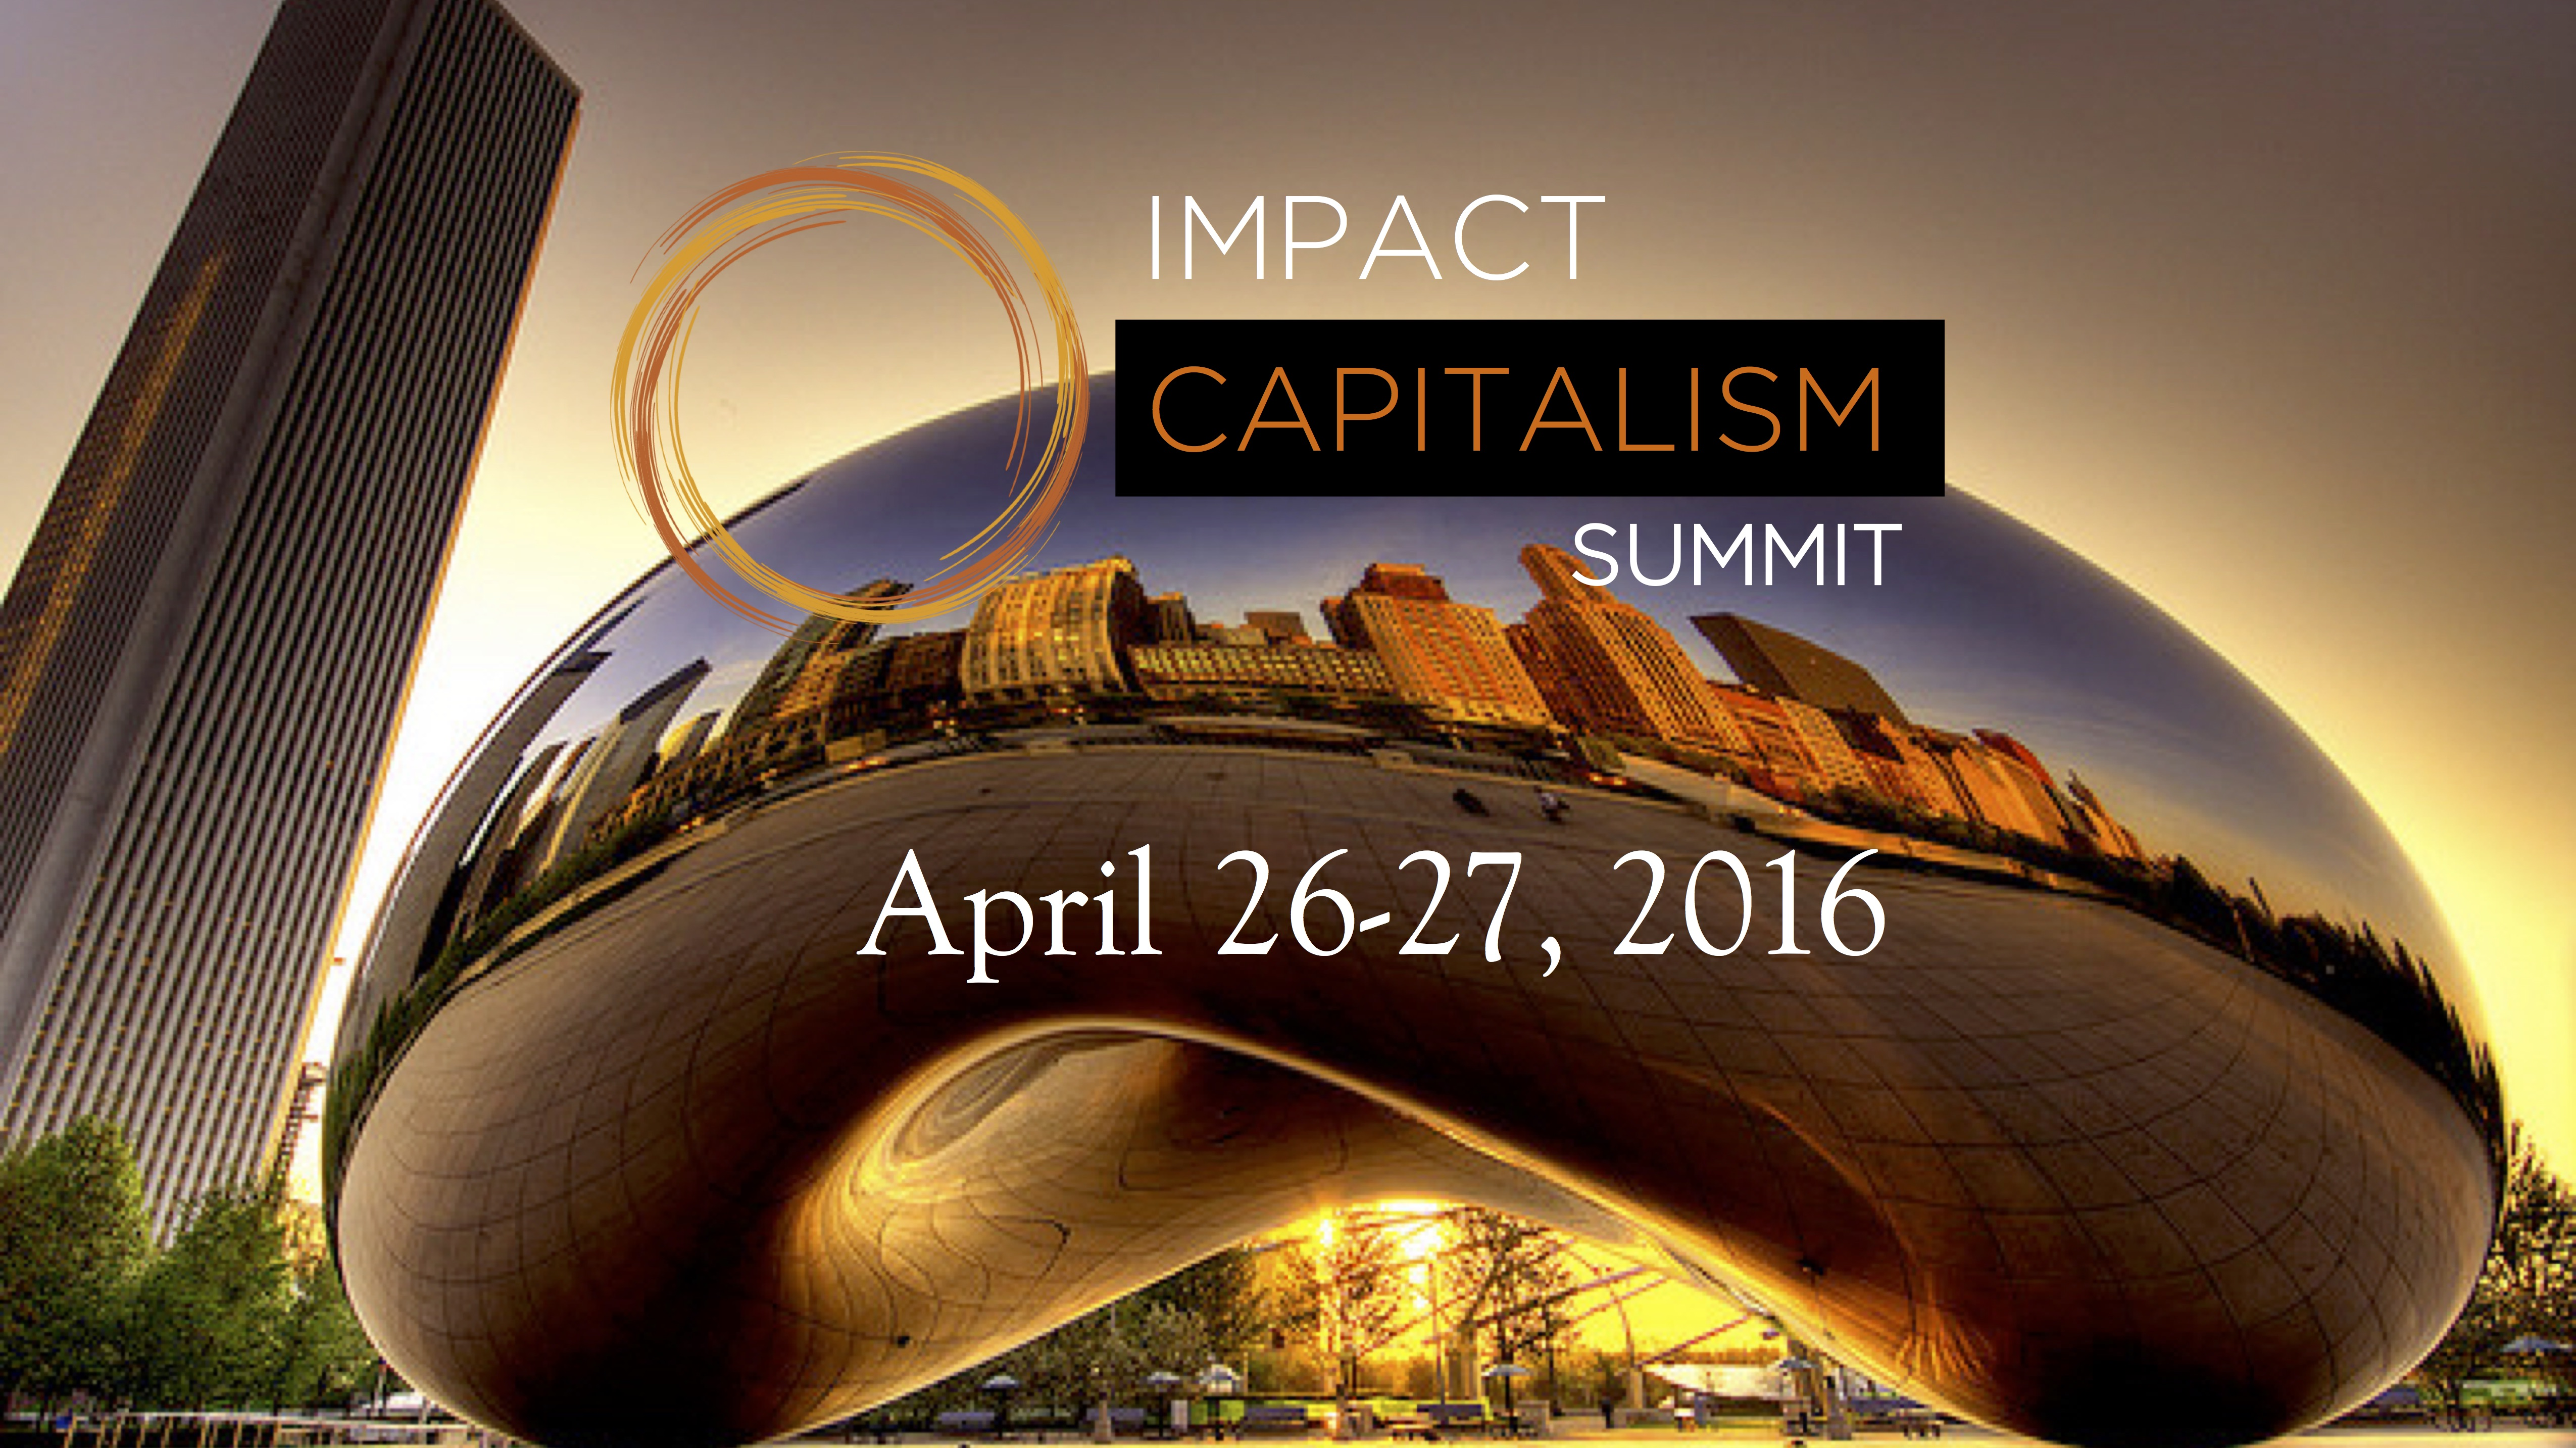 Impact Capitalism Summit | April 26-27